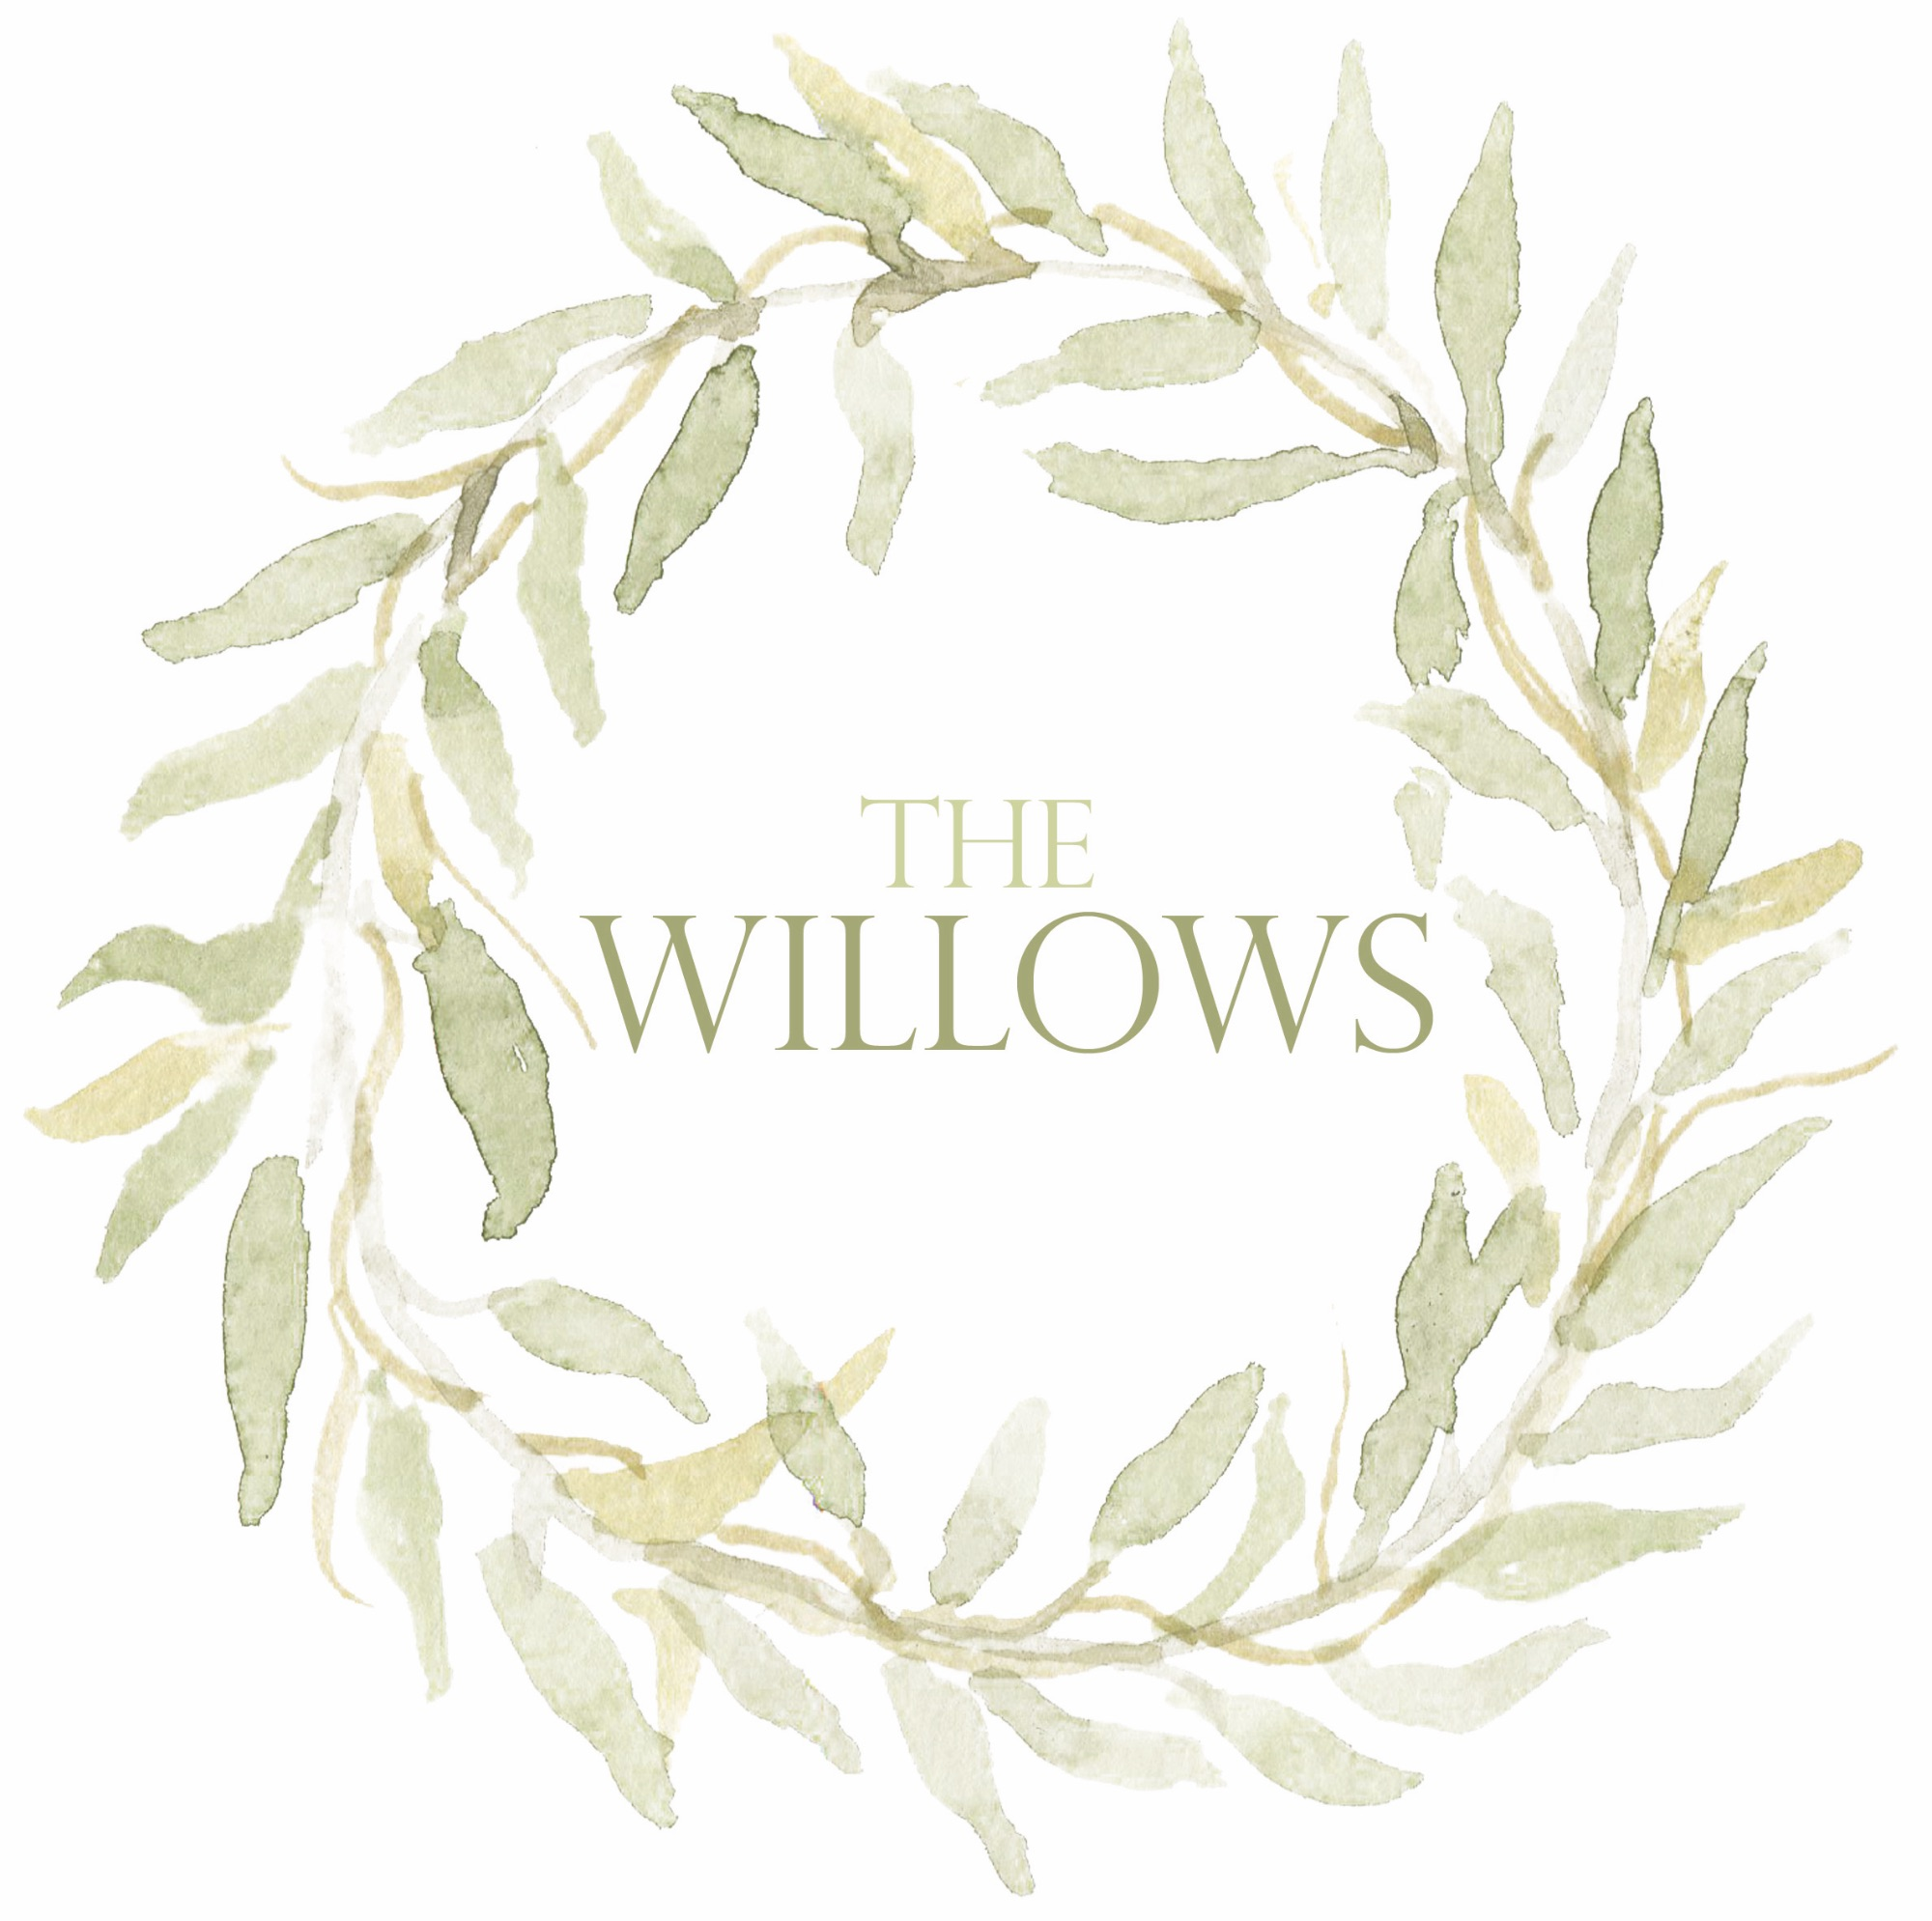 The Willows HERO LOGO